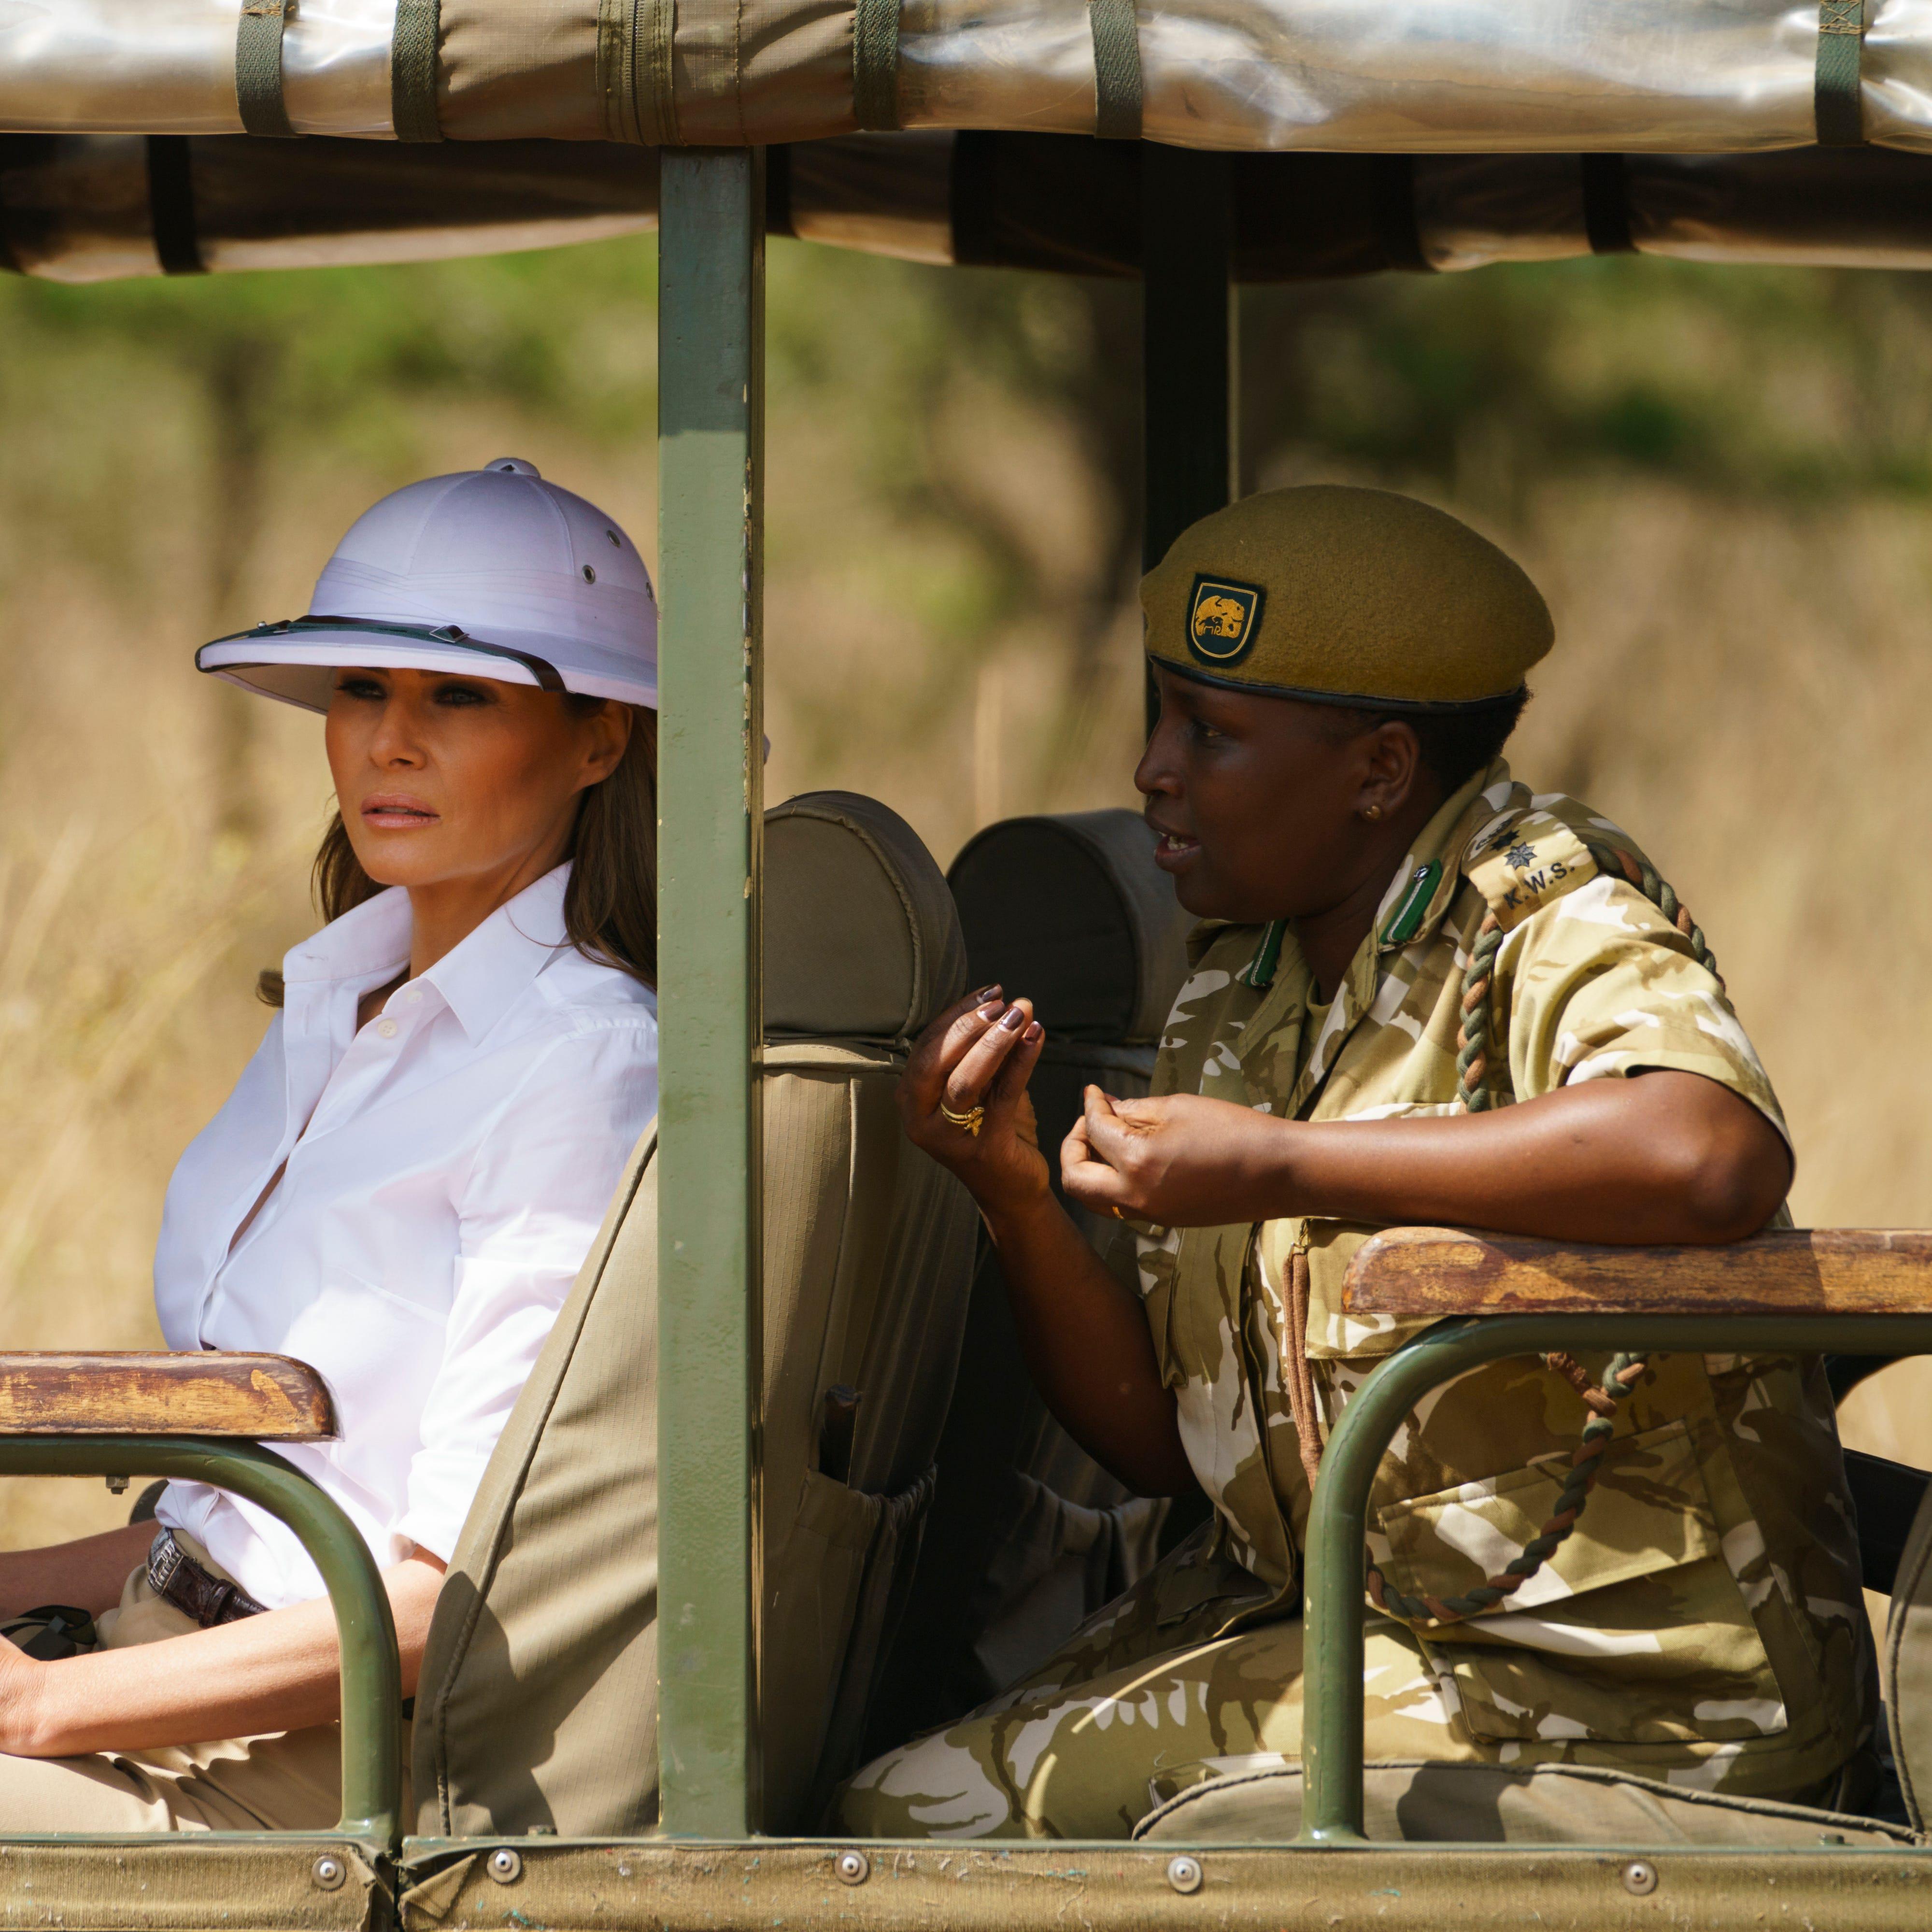 Melania Trump looks out over Nairobi National Park in Nairobi, Kenya on Oct. 5, 2018.